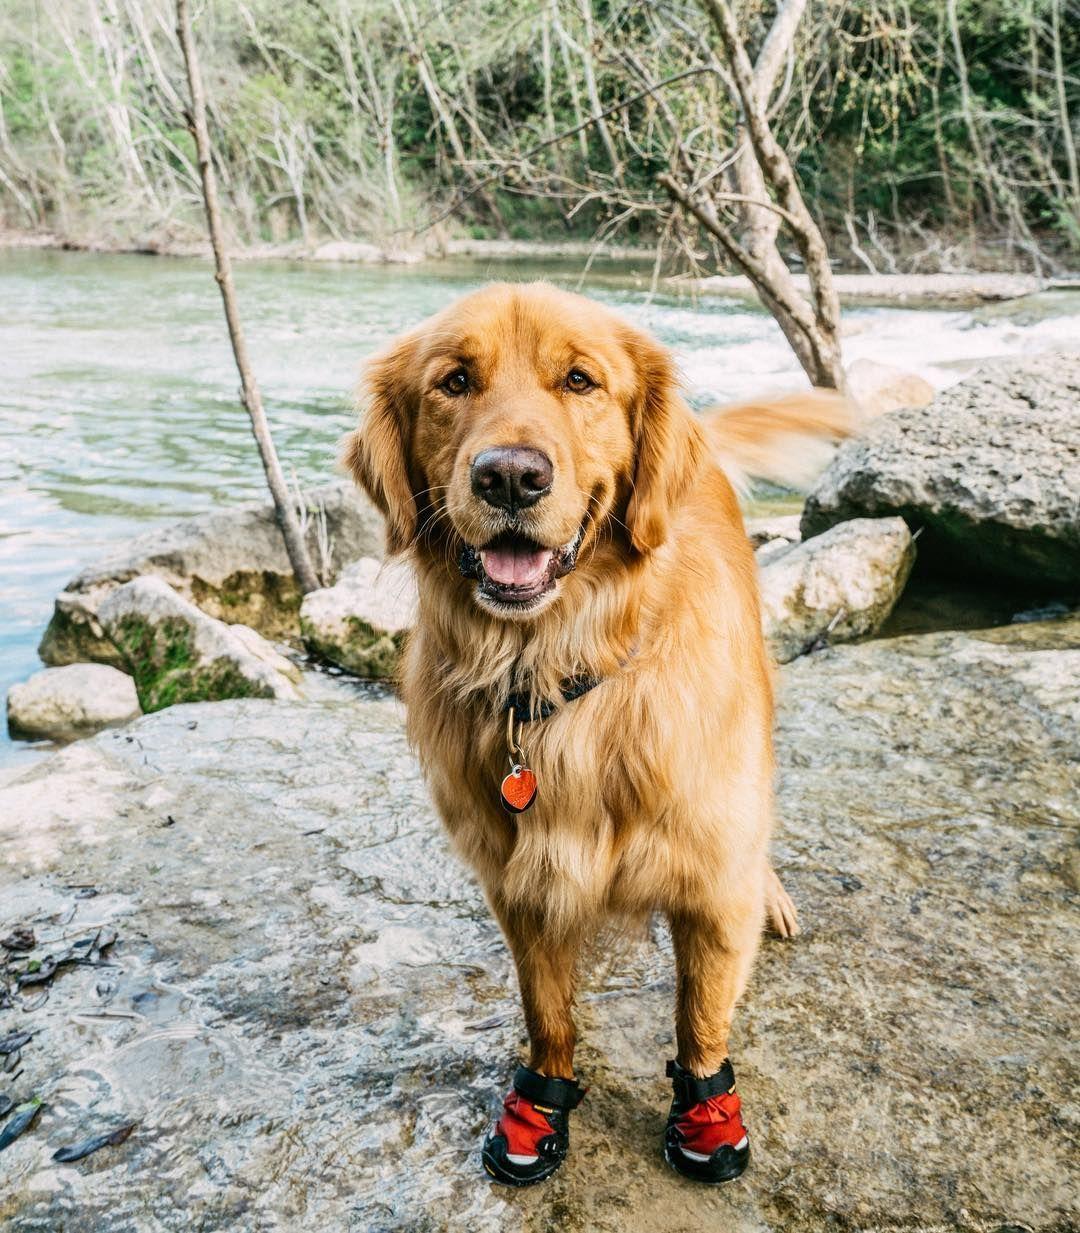 Golden Retriever Puppies For Sale Near Me Craigslist